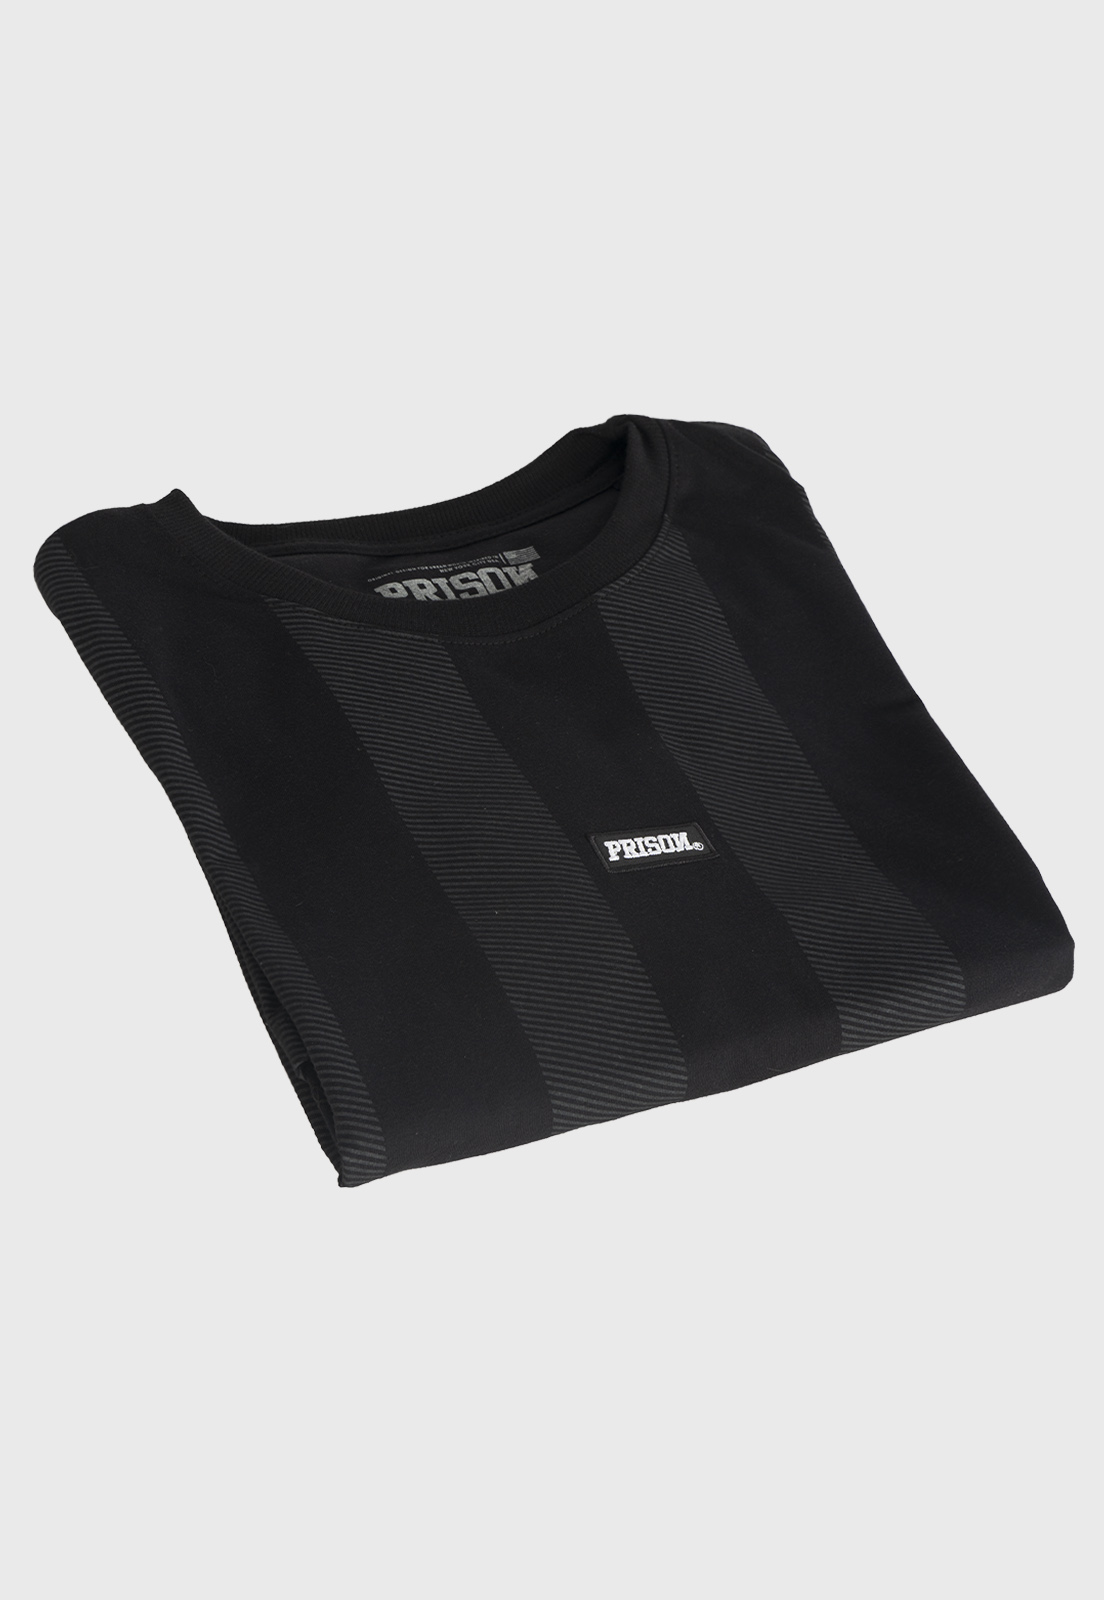 Camiseta Prison Listrada Long Black